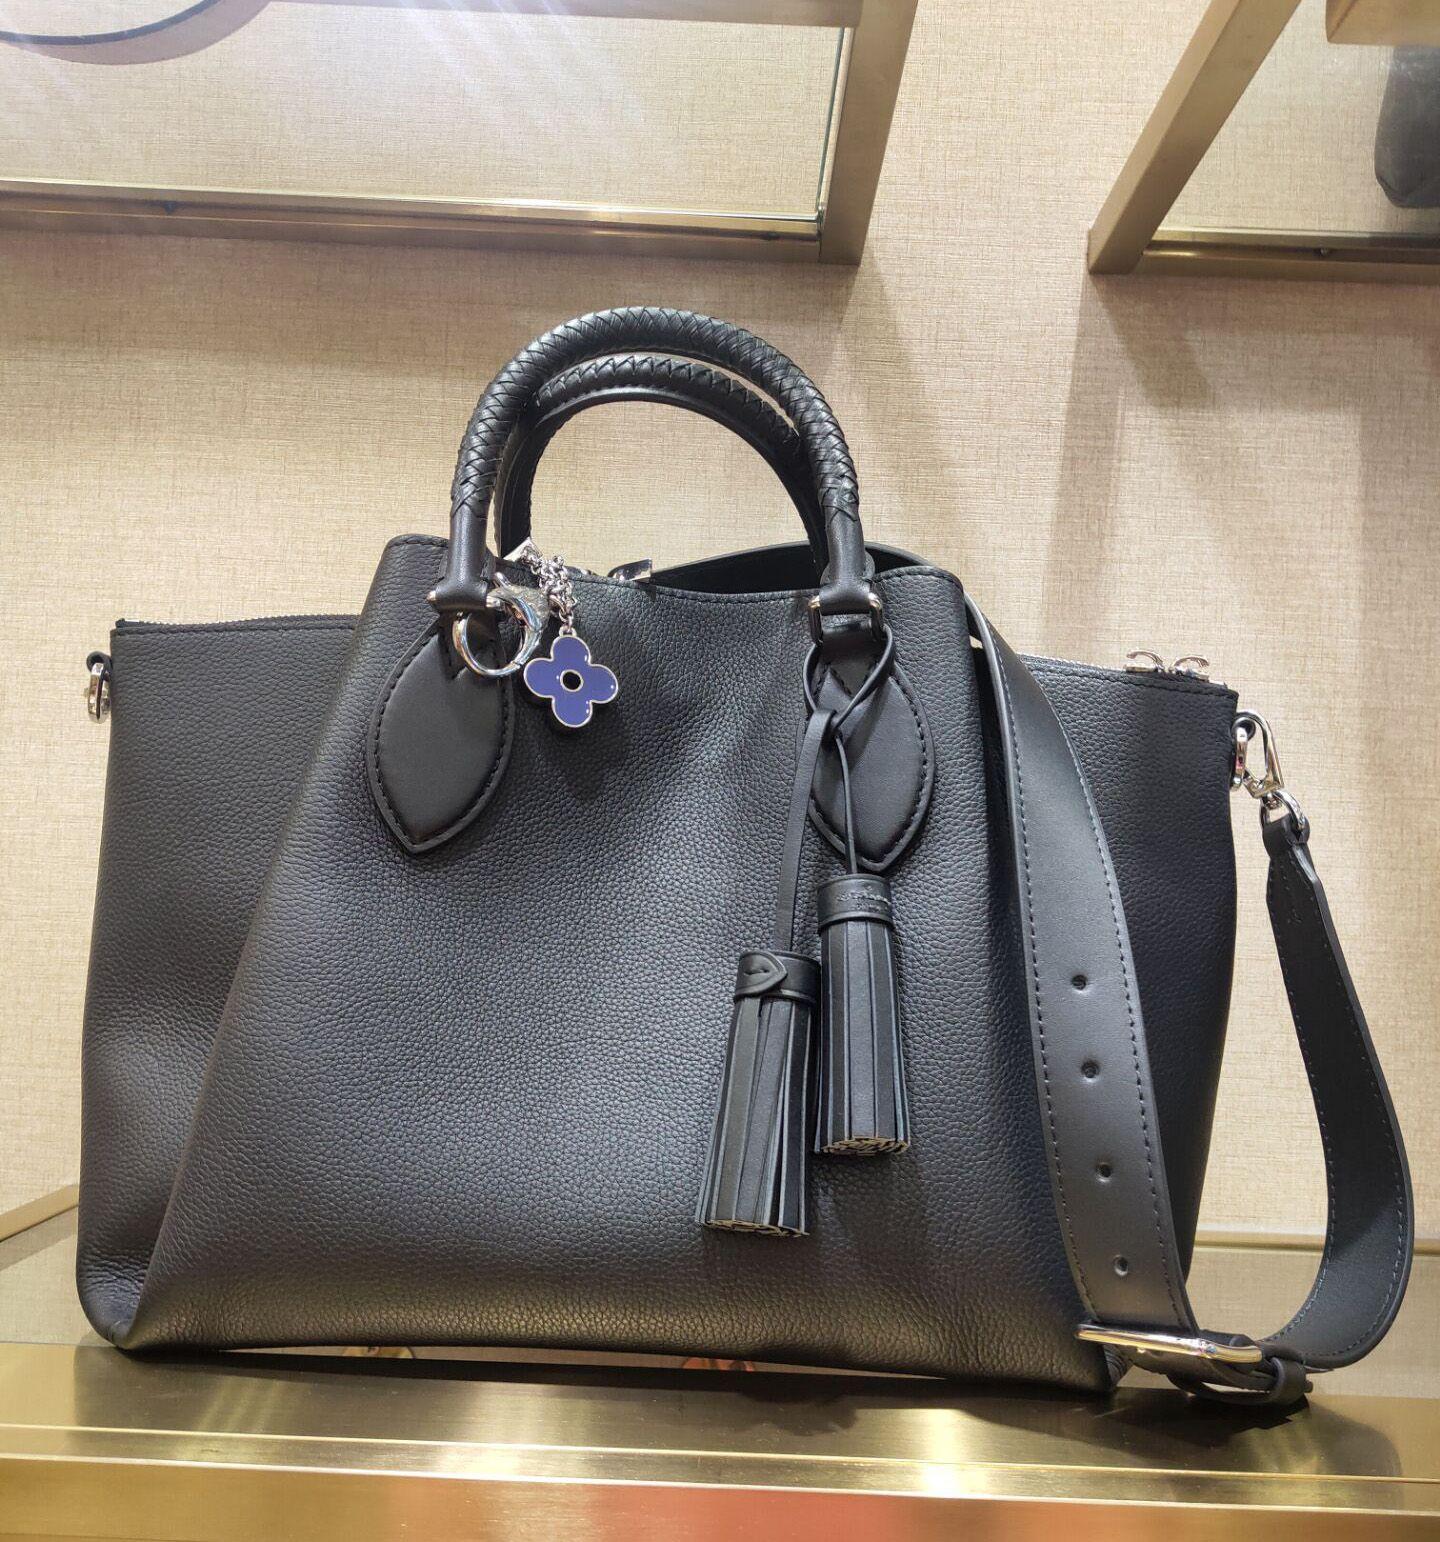 25d01cf69508 New European Classic Luxury Fashion Ladies Fashion Bag